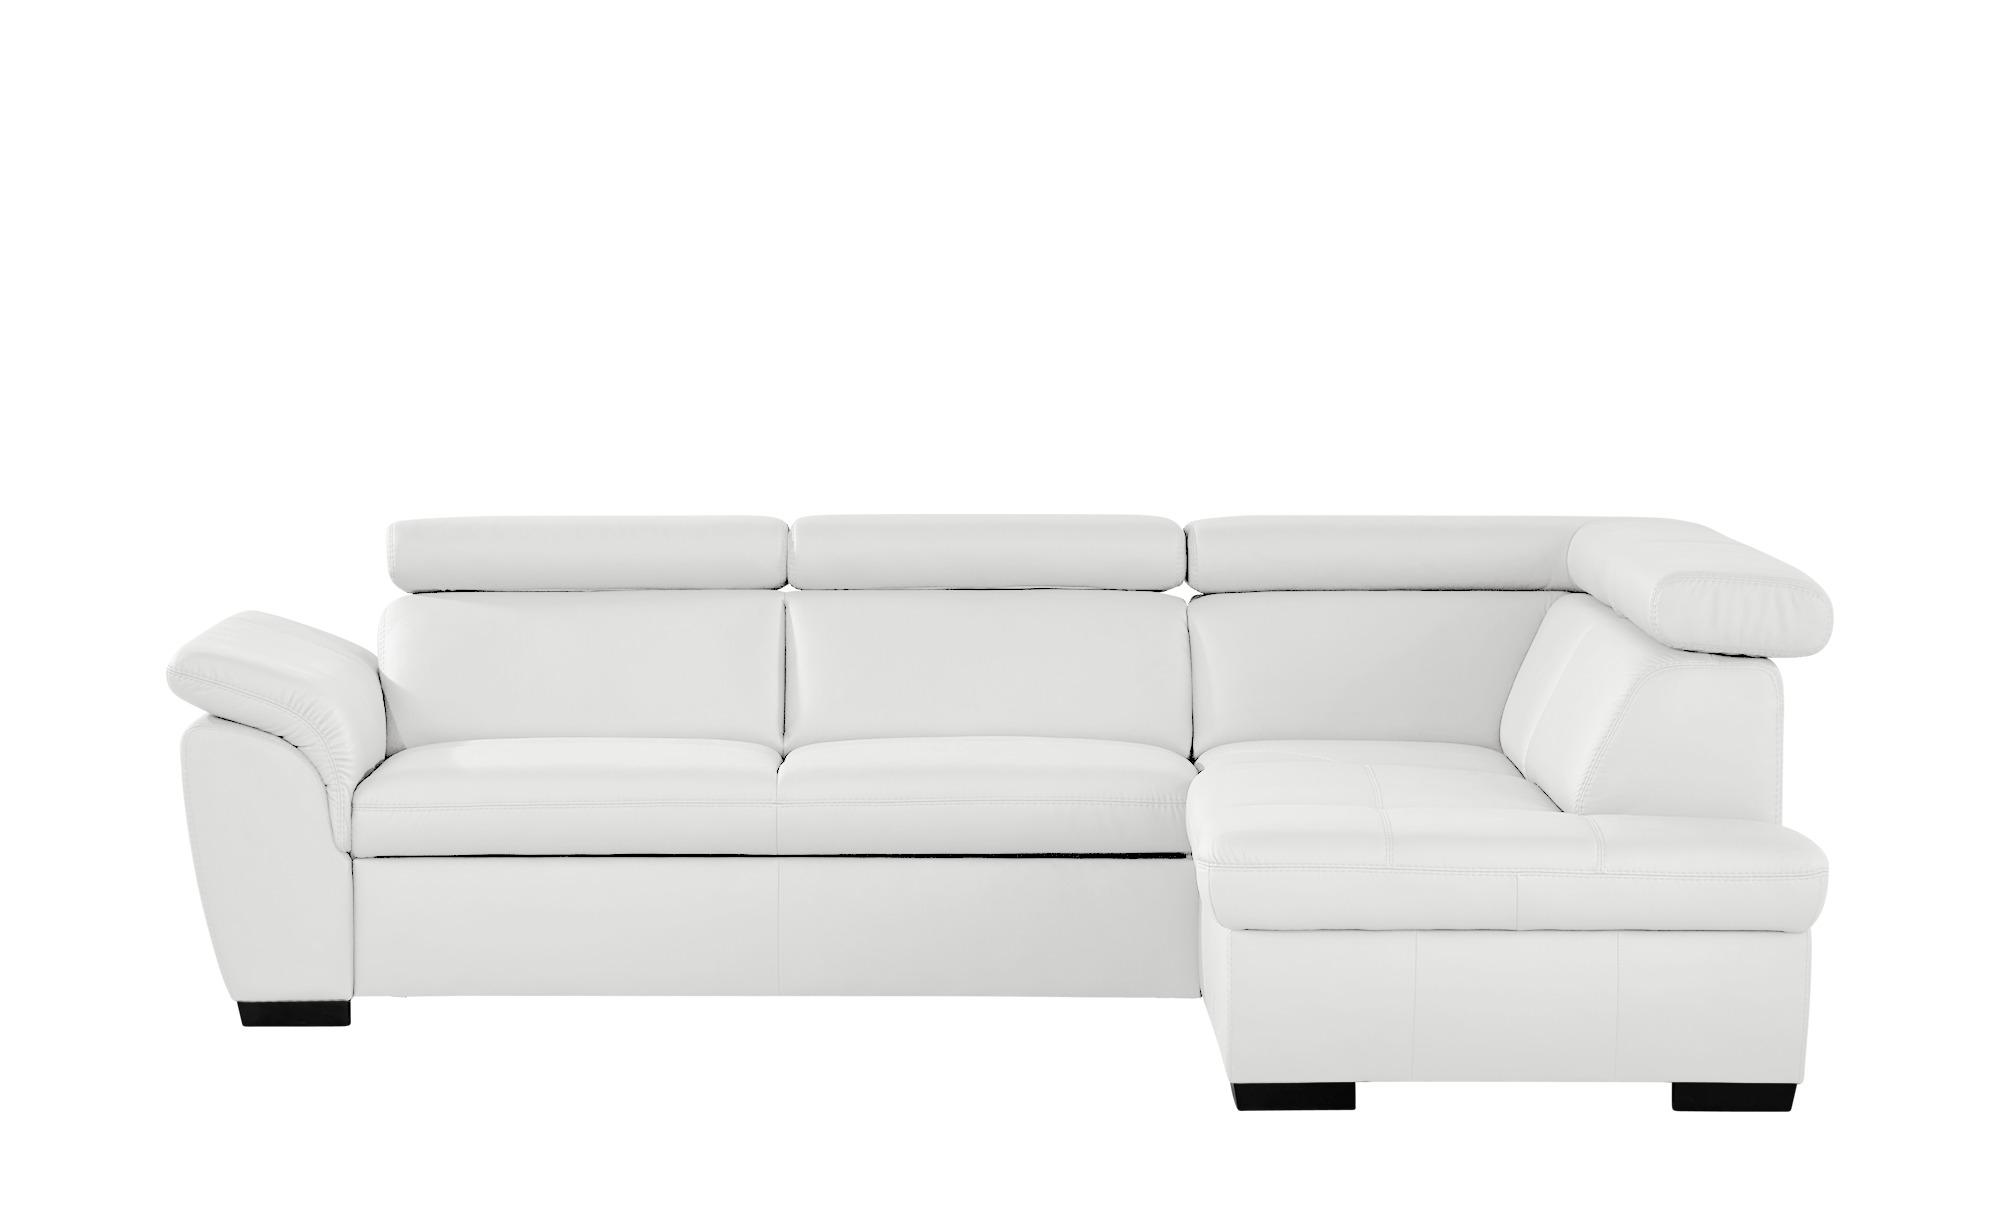 Uno Ecksofa Aus Leder Samantha Gefunden Bei Mobel Hoffner Big Sofa Kaufen Sofa Leder Sofa Design